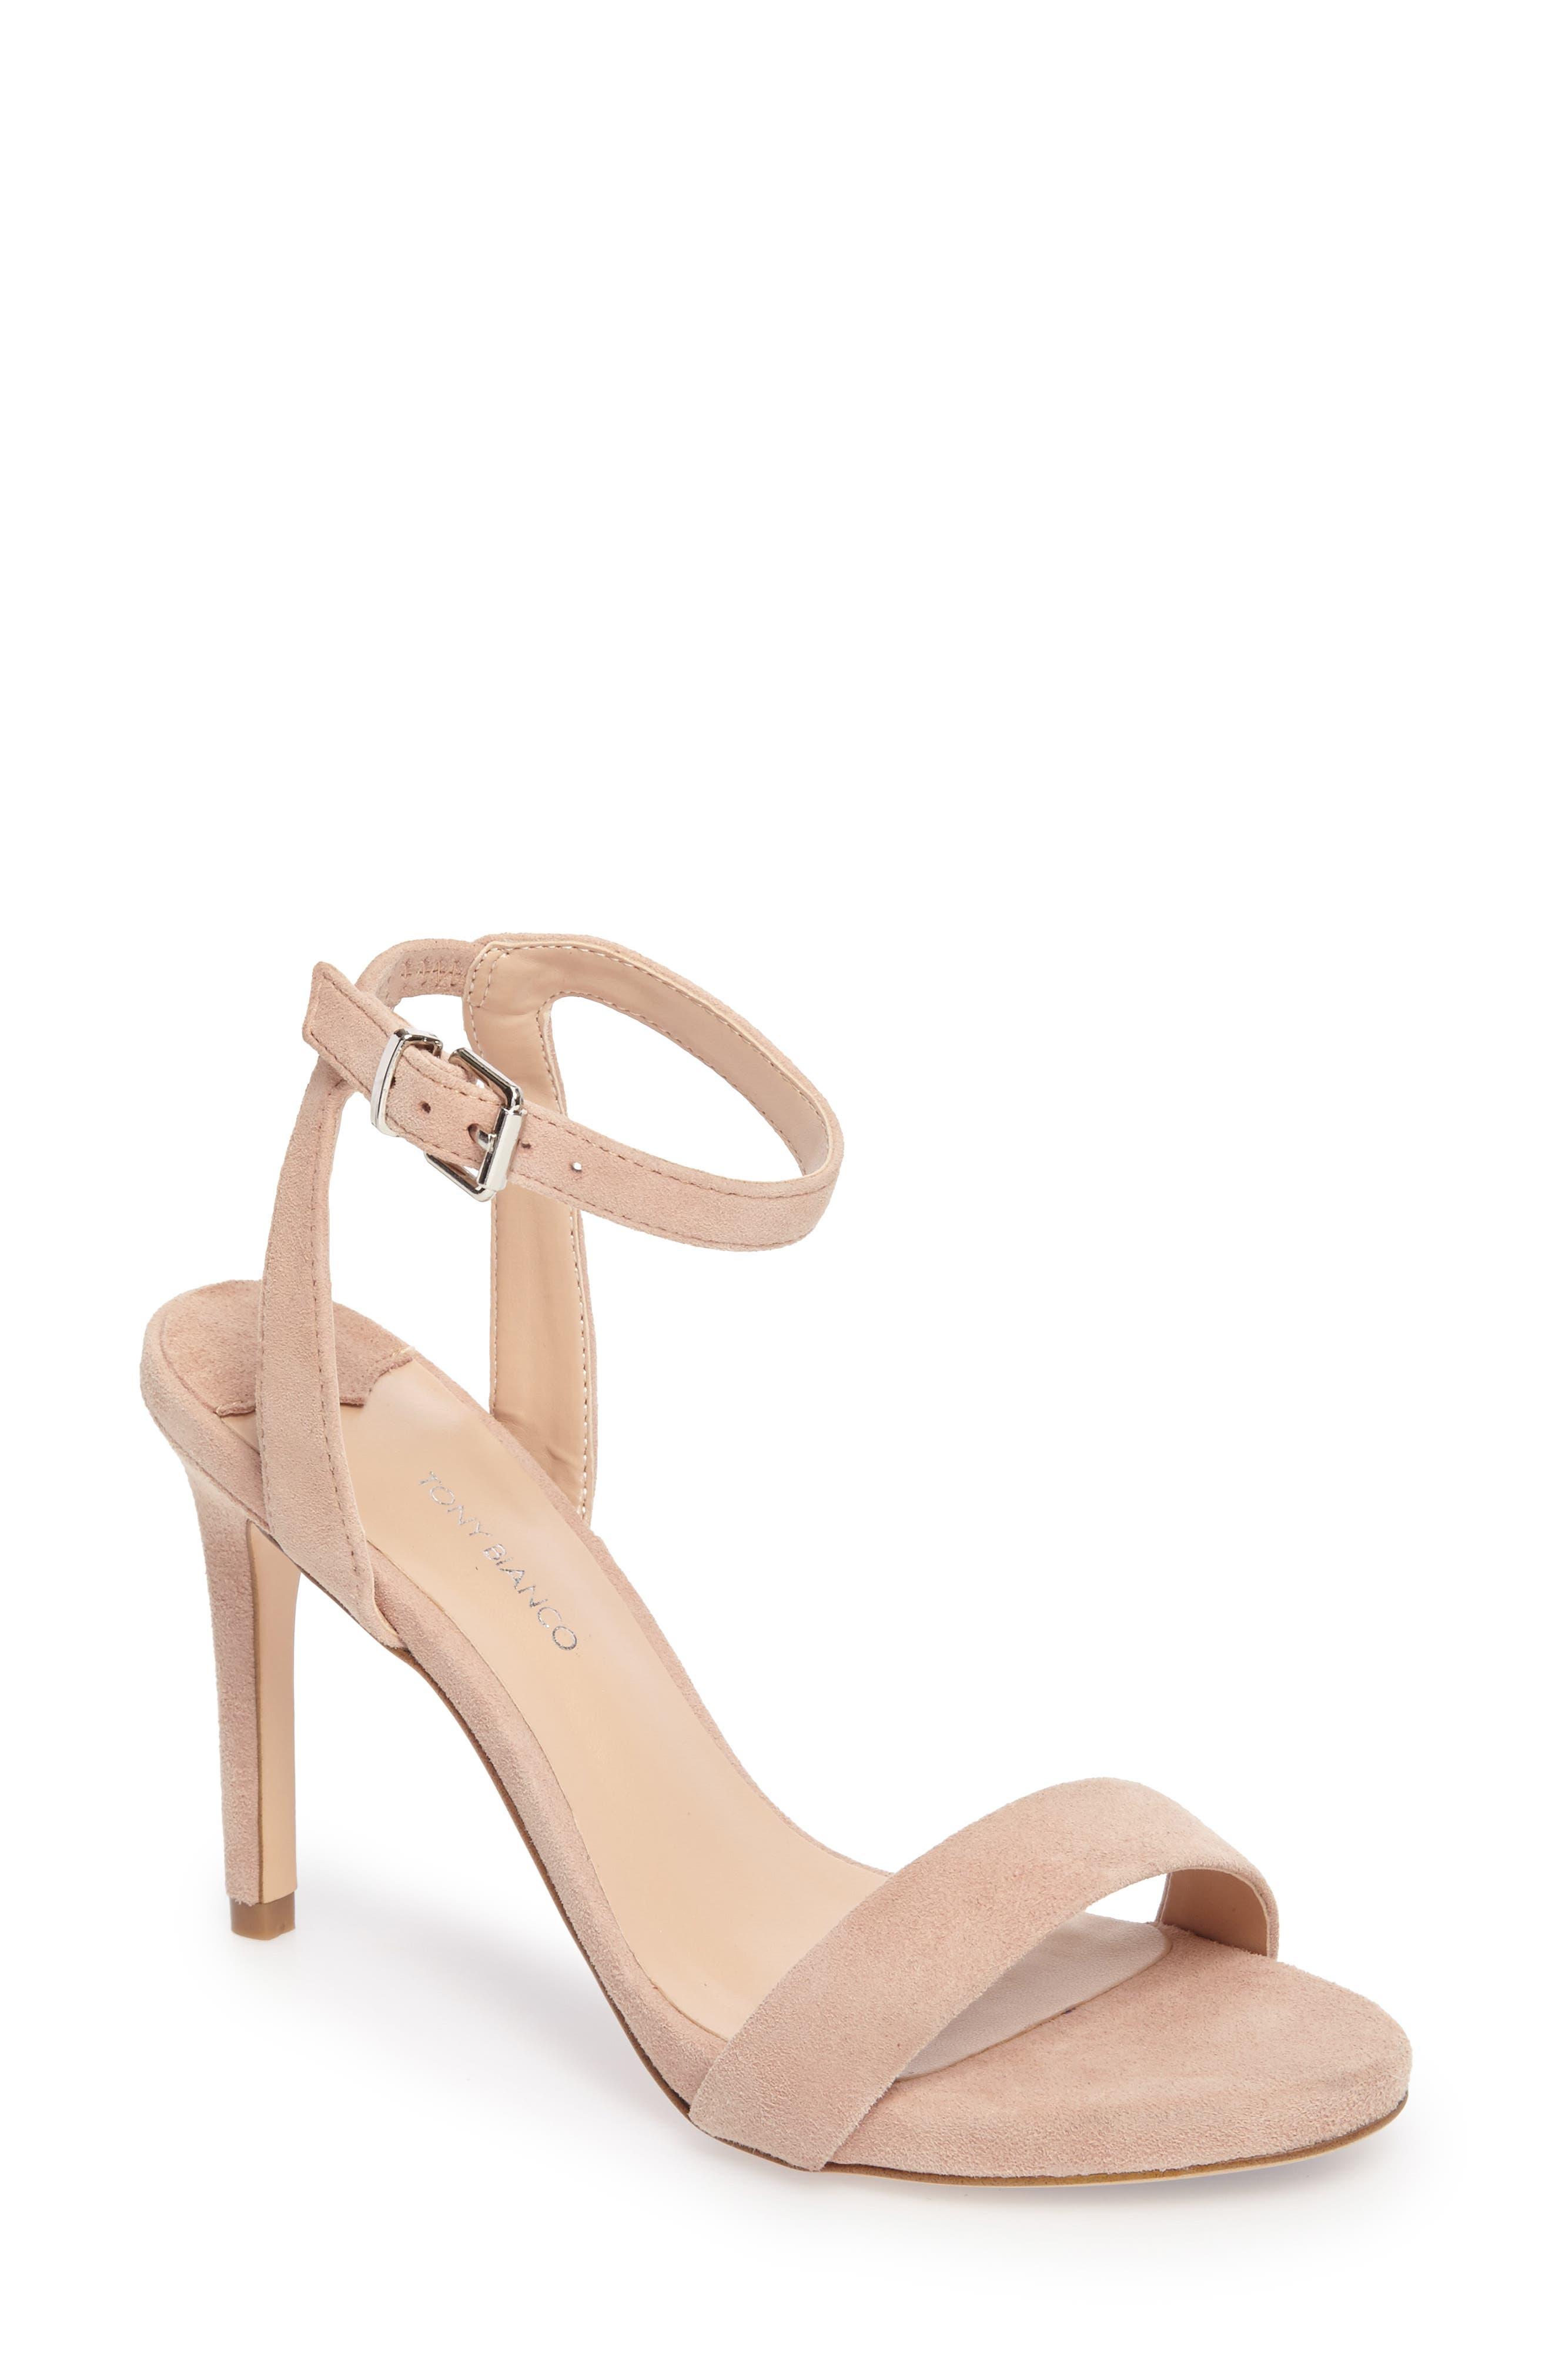 Tony Bianco Char Ankle Cuff Sandal (Women)